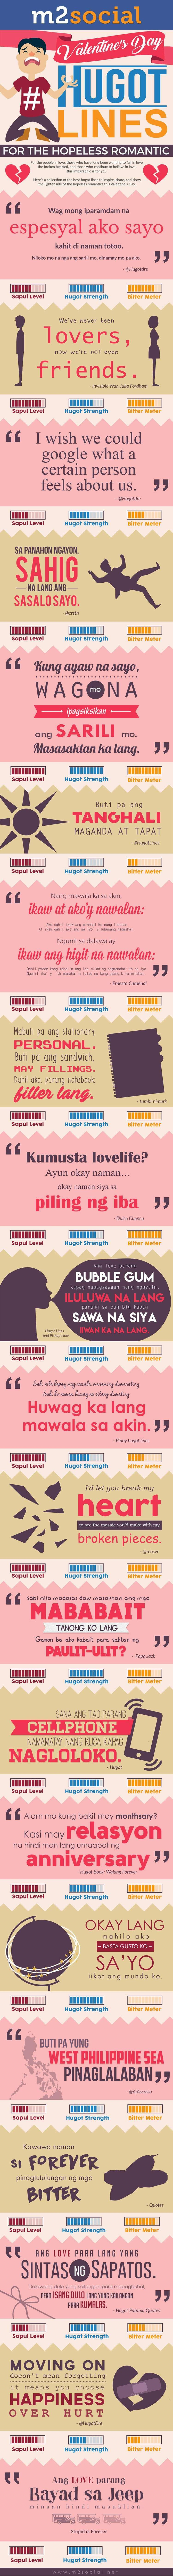 Valentine S Day Hugot Lines For The Hopeless Romantic Infographic Portal Hugot Lines Hugot Tagalog Quotes Hugot Funny